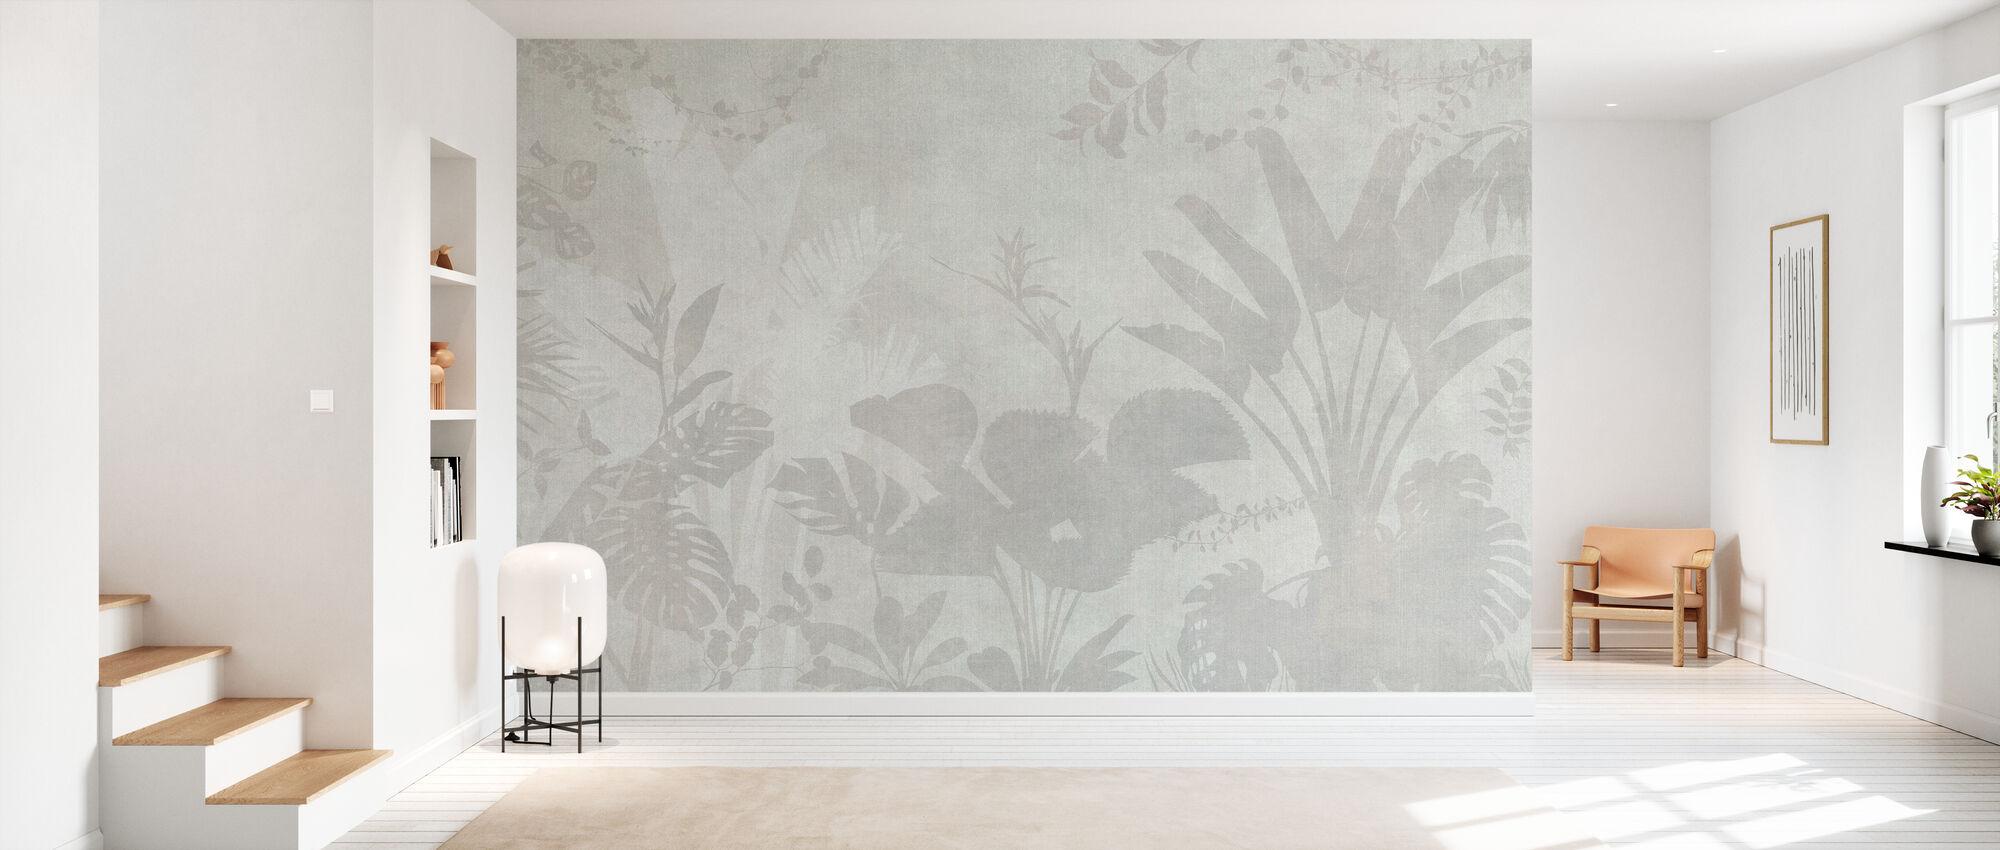 Pantanal Night - Light Ash - Wallpaper - Hallway